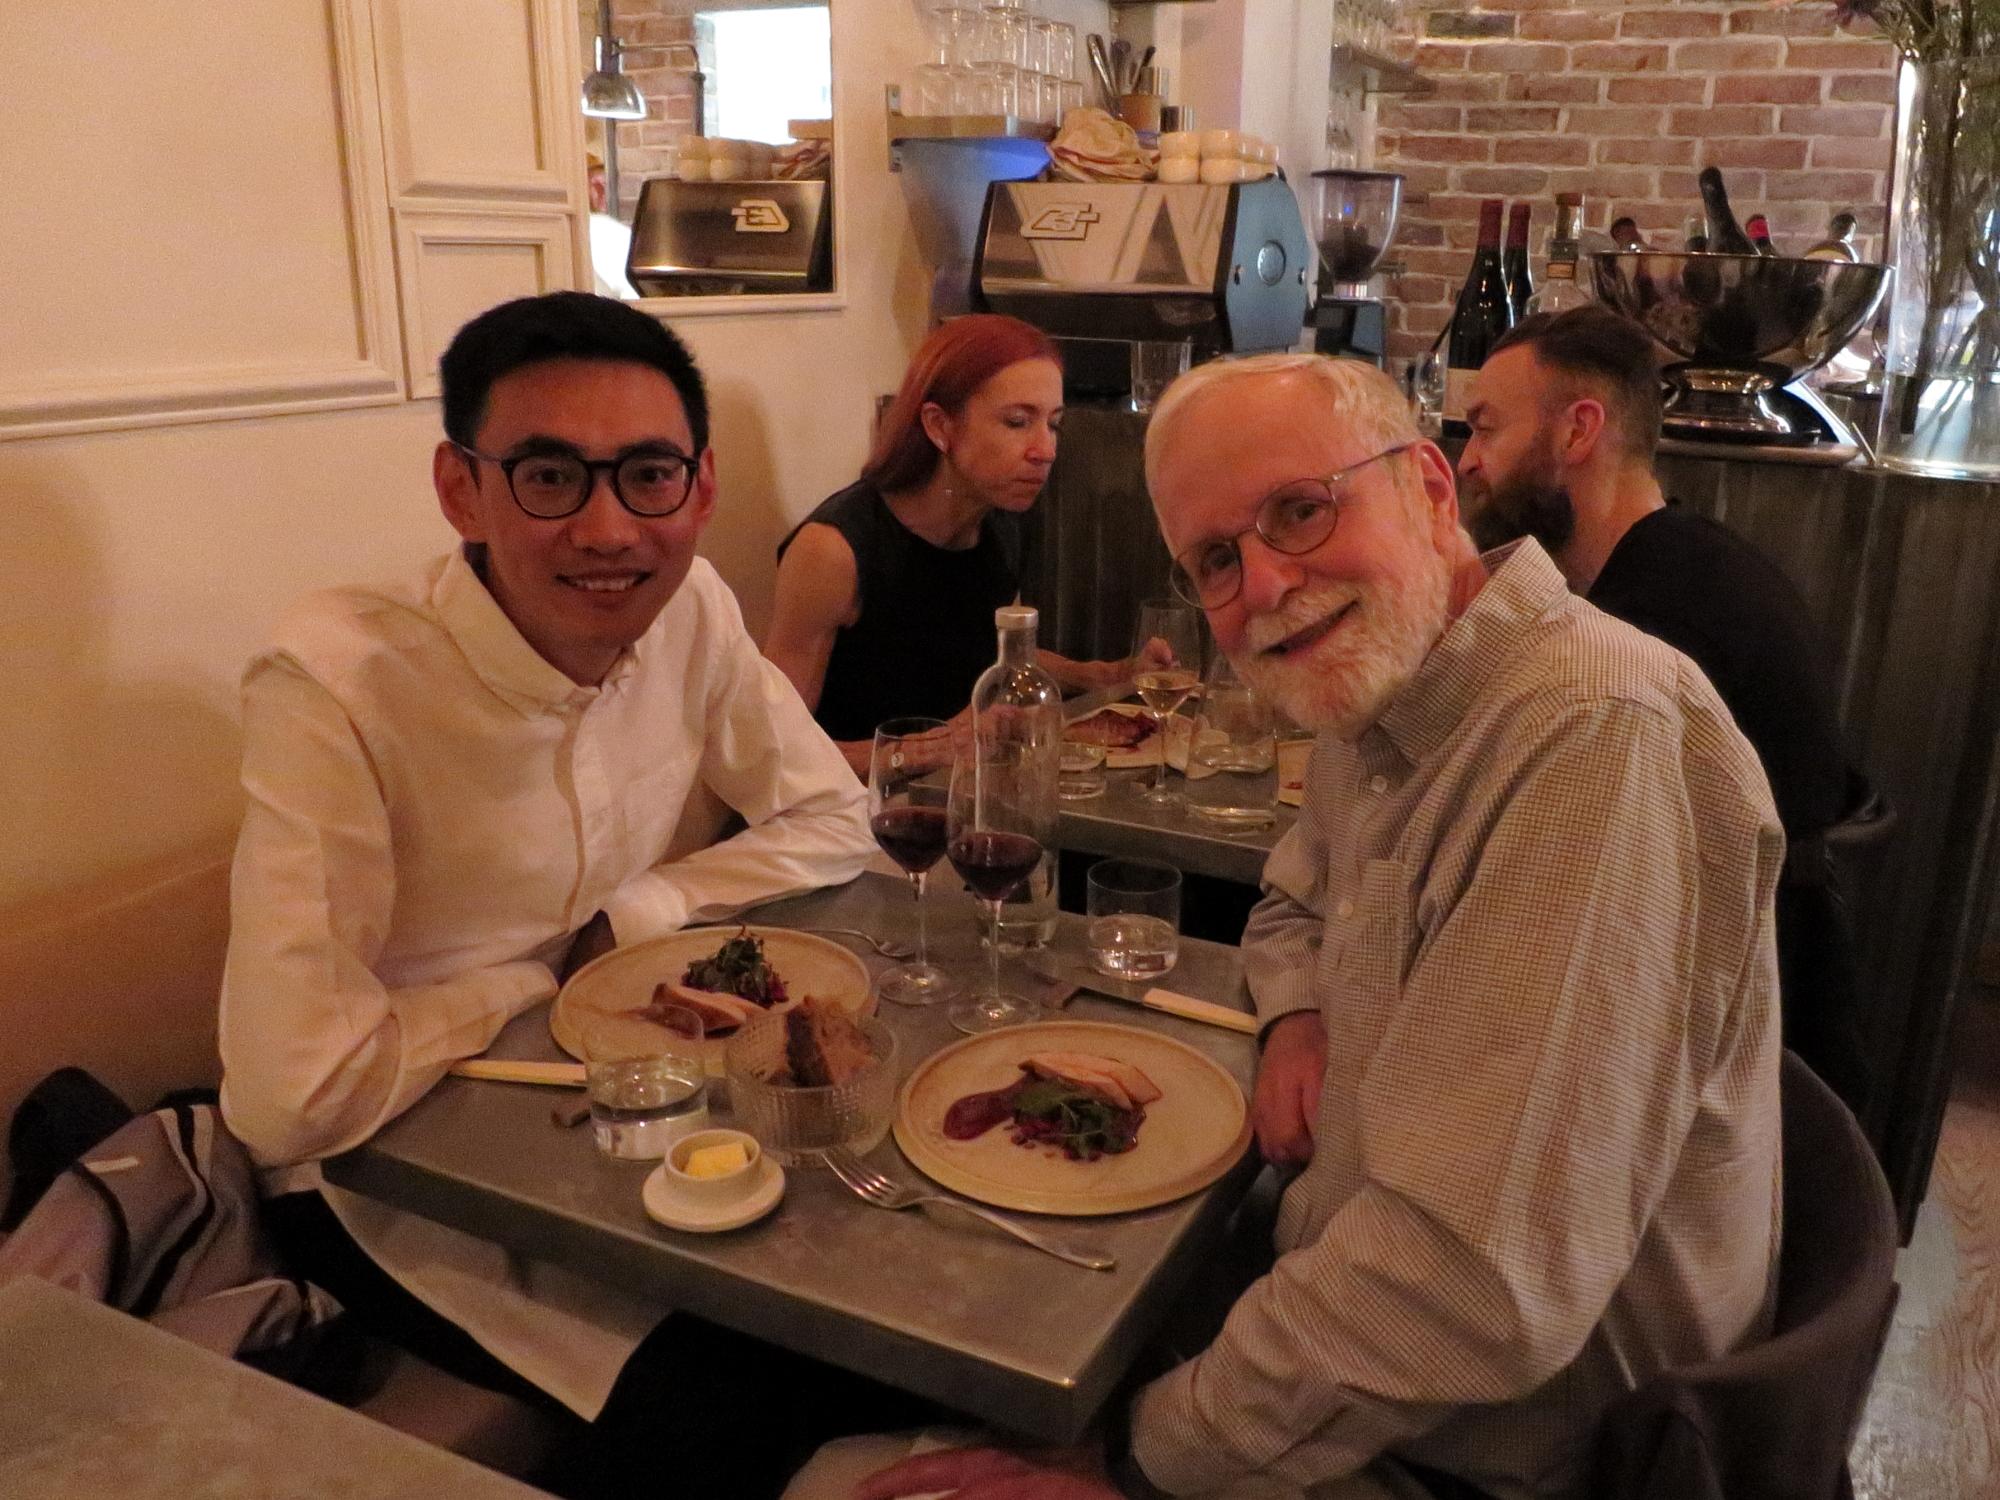 Kristoffer's birthday diner at Frenchie